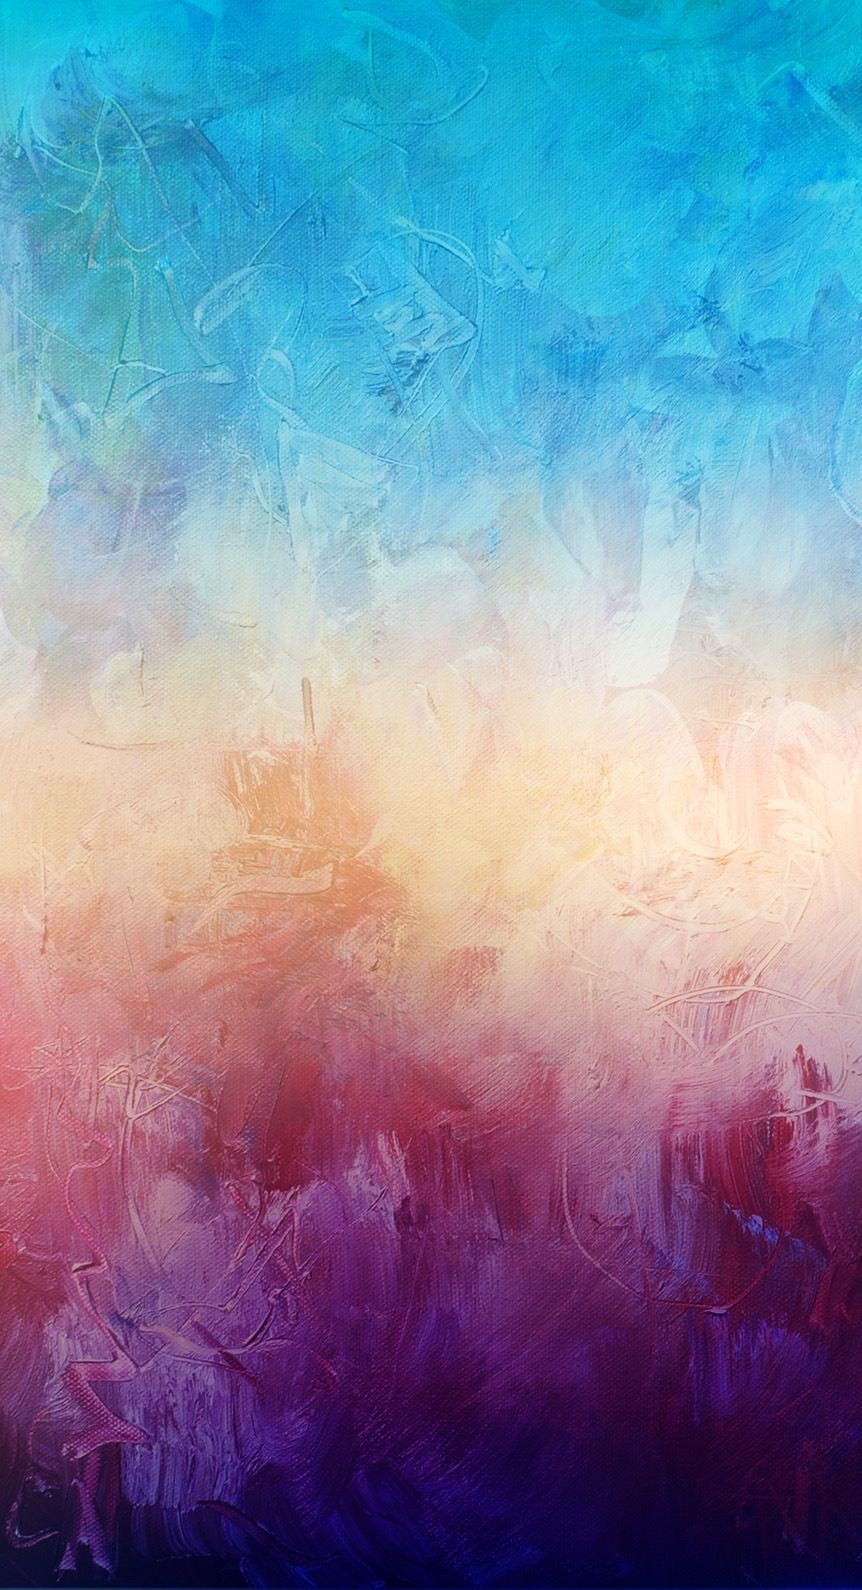 2016 iphone wallpaper - Bing images | Colors, Wallpaper! | Pinterest | Wallpaper, Phone and ...